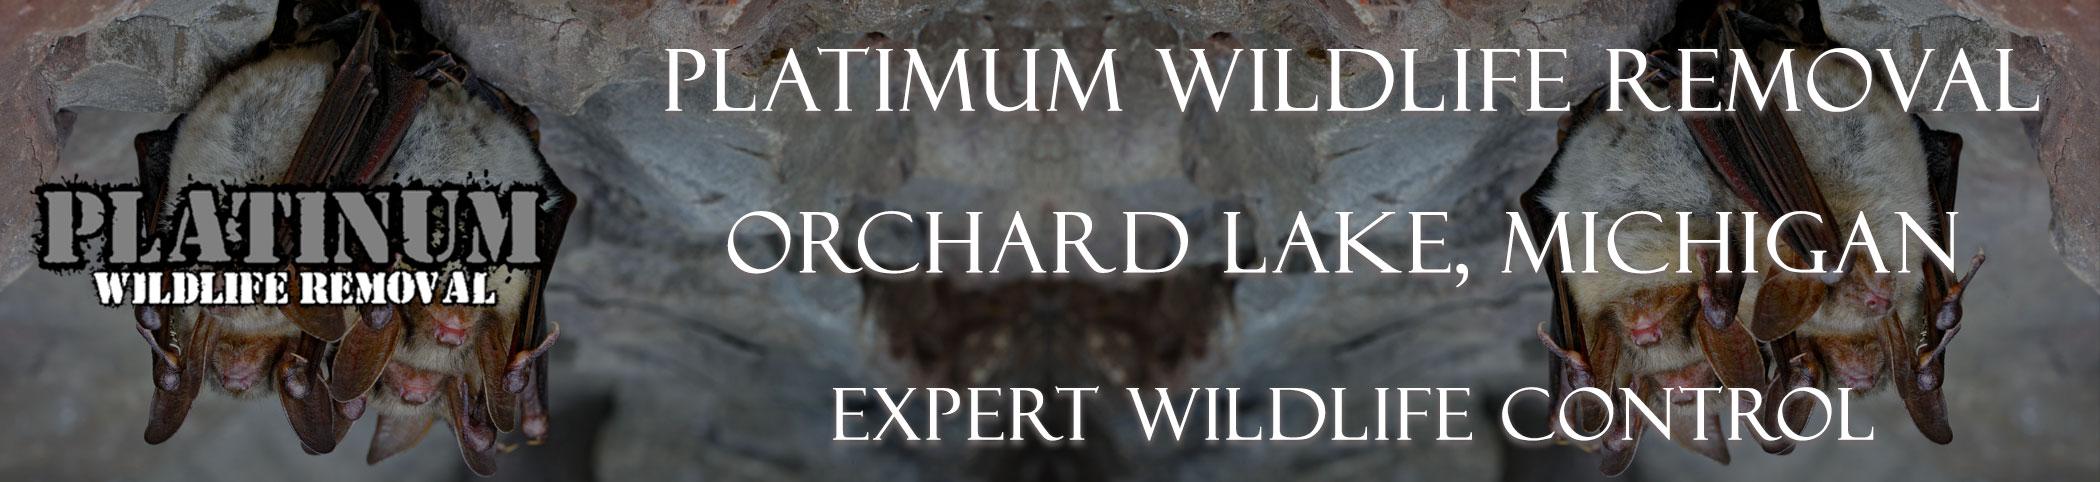 Orchard-Lake-Platinum-Wildlife-Removal-michgan